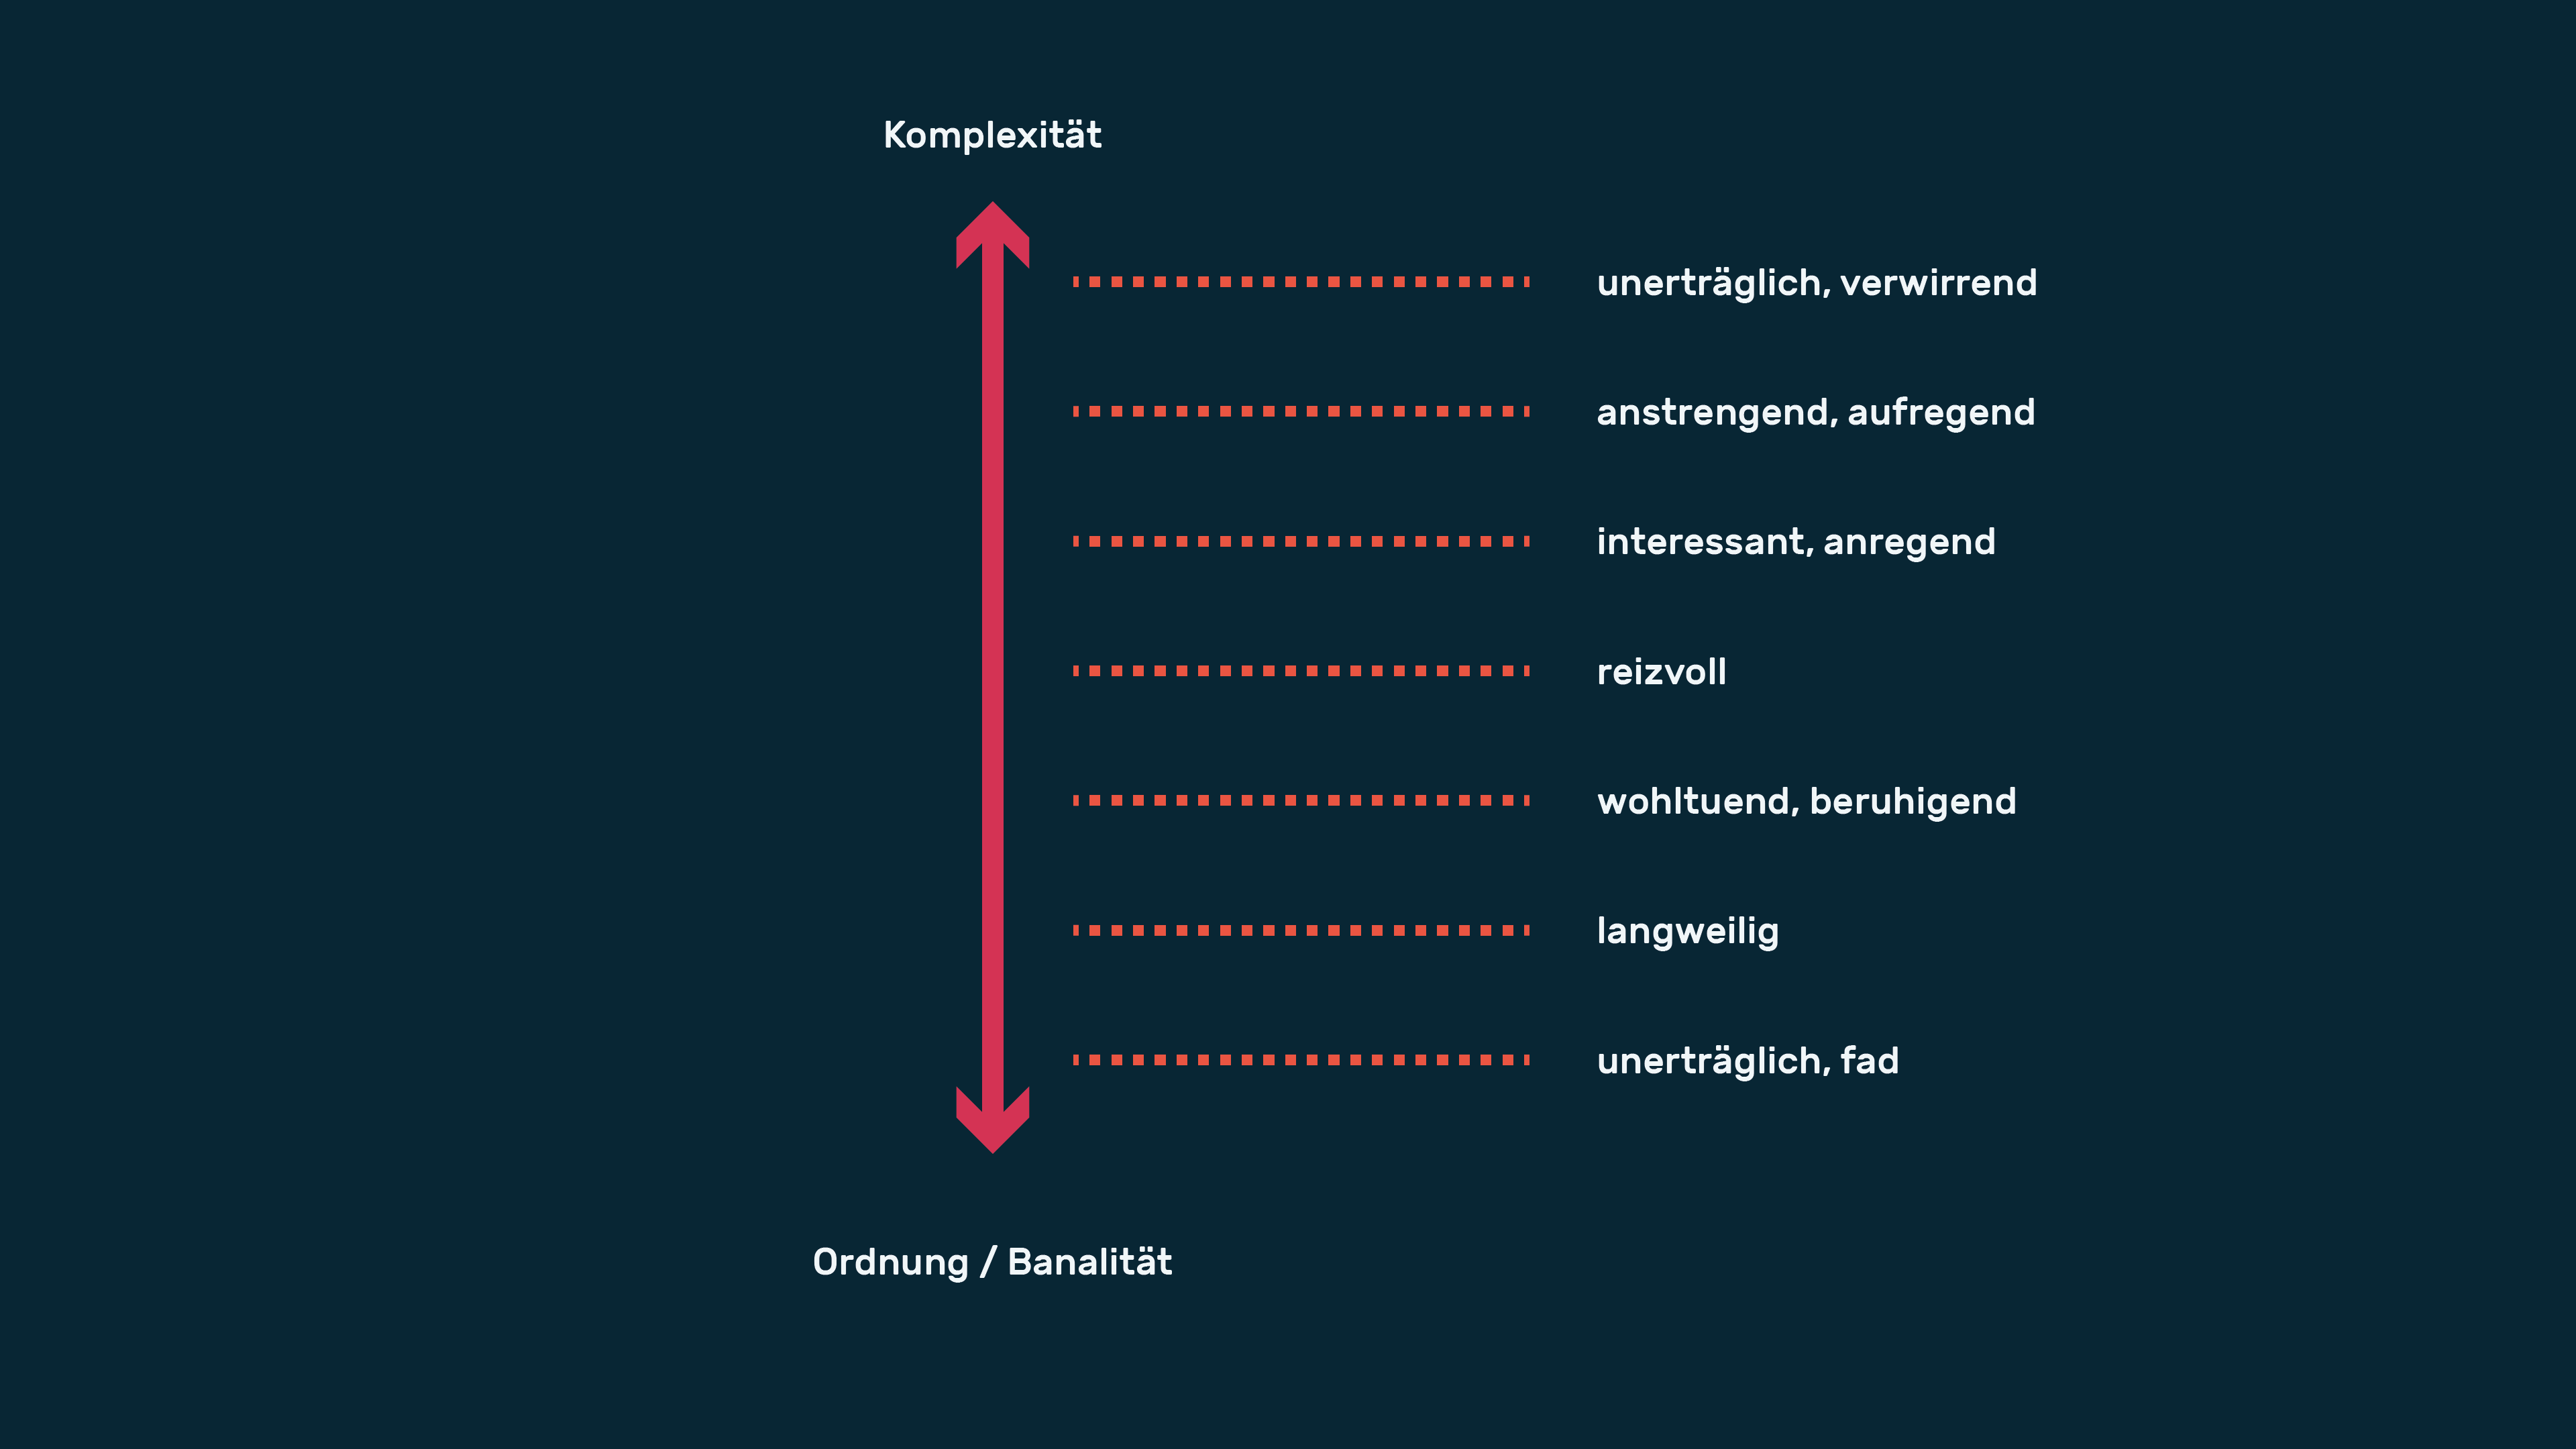 infografik userinterfacedesign ordnung komplexitaet